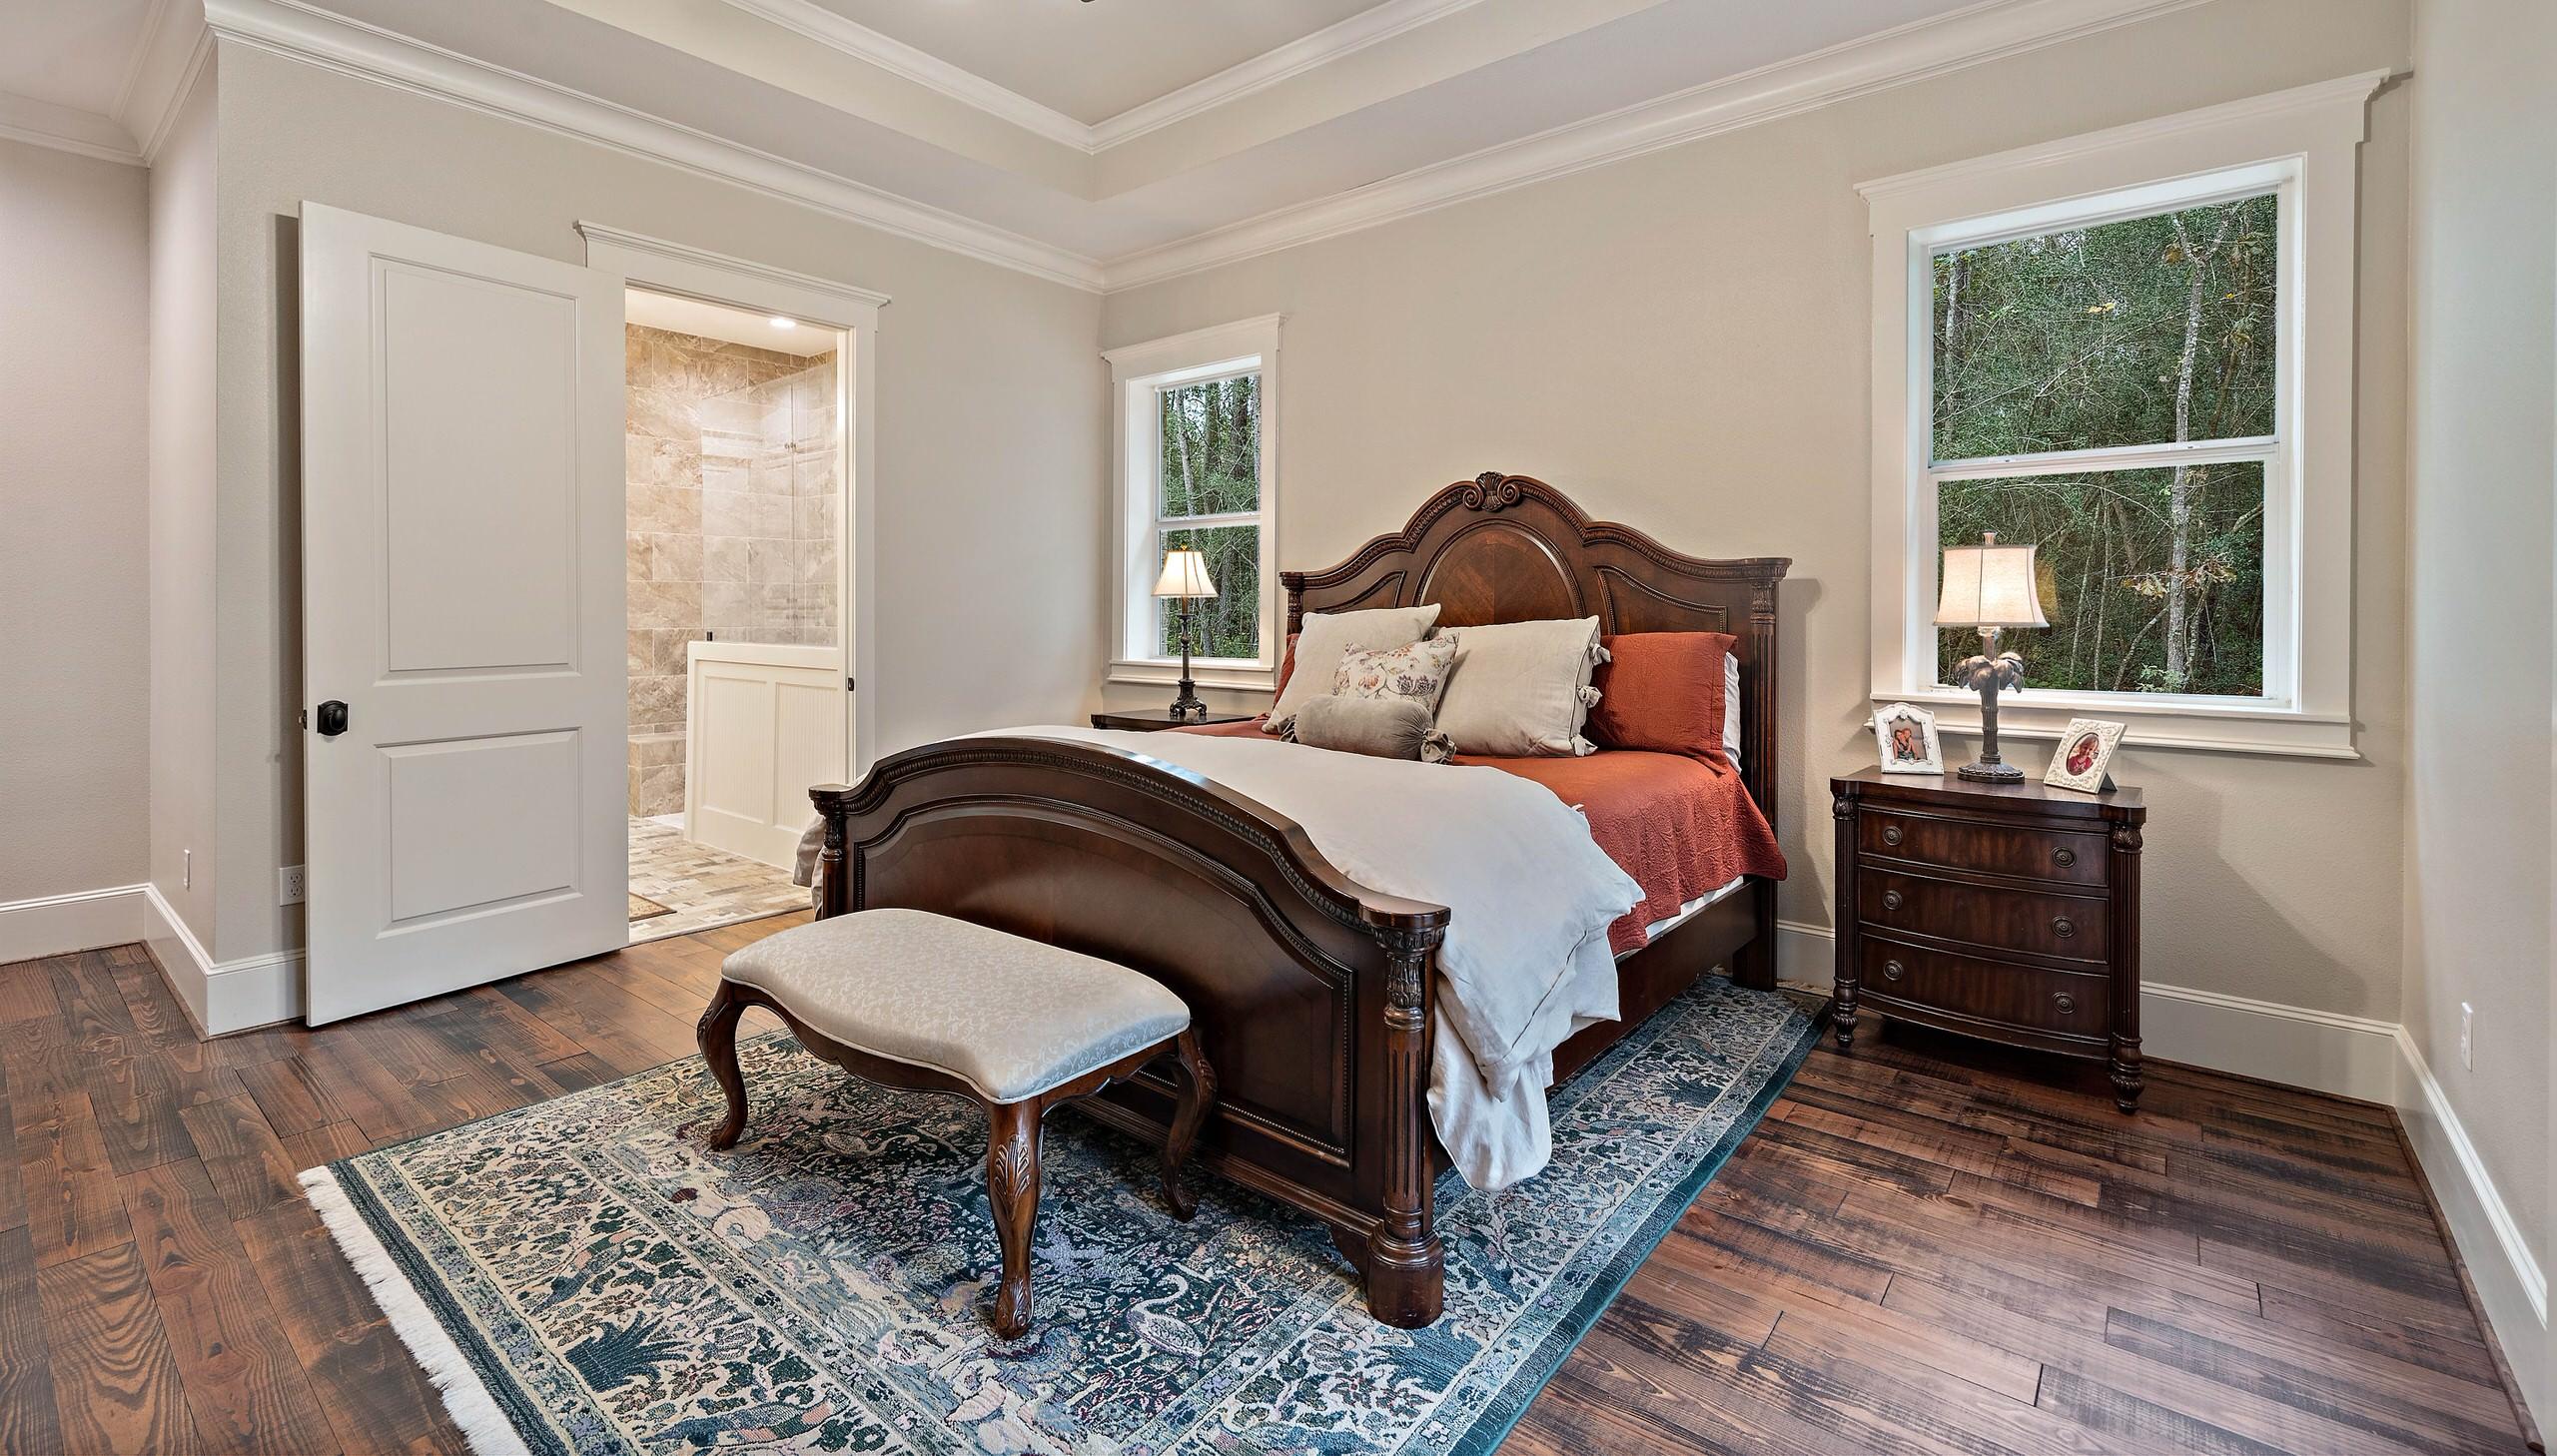 75 Beautiful Bedroom Pictures Ideas November 2020 Houzz